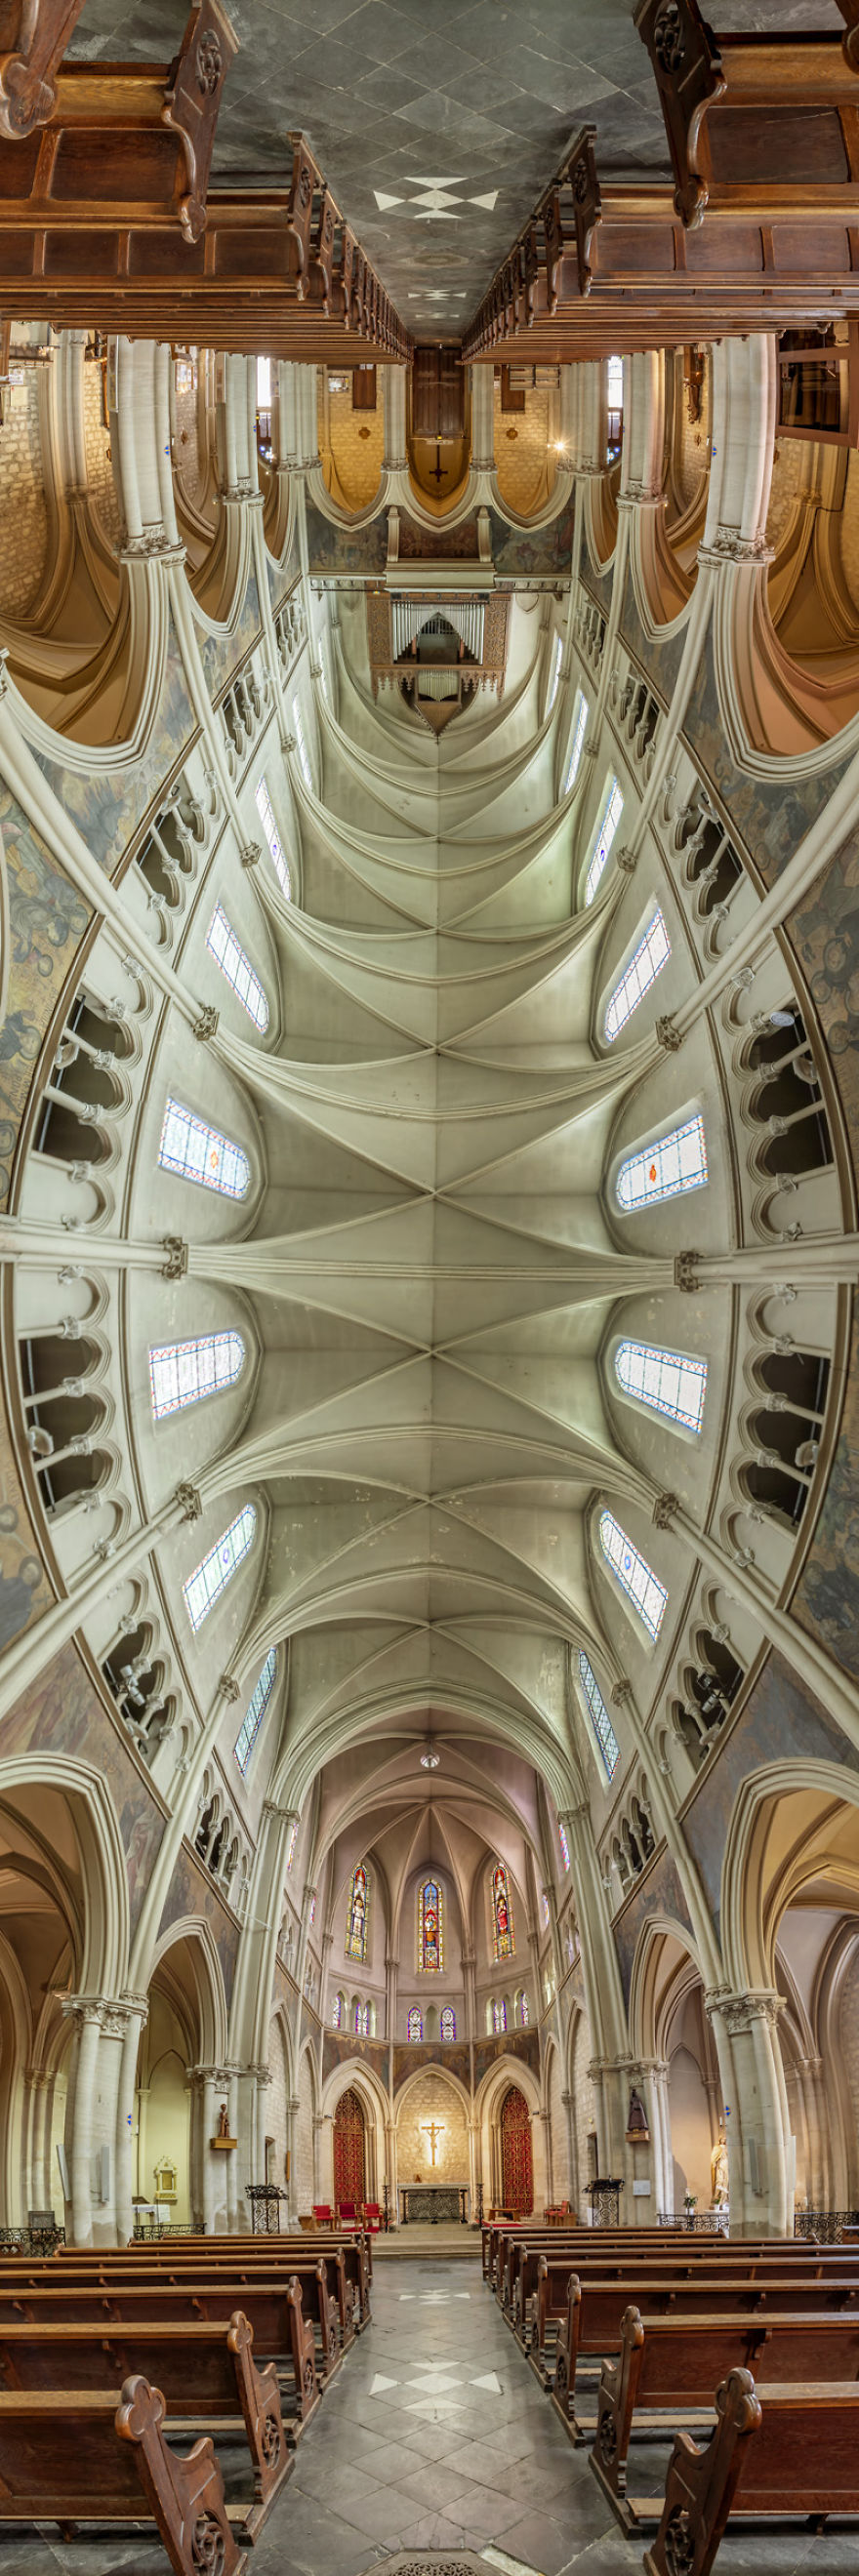 Eglise-Saint-Joseph-Artisan-Paris-France-5afb3835983f0__880